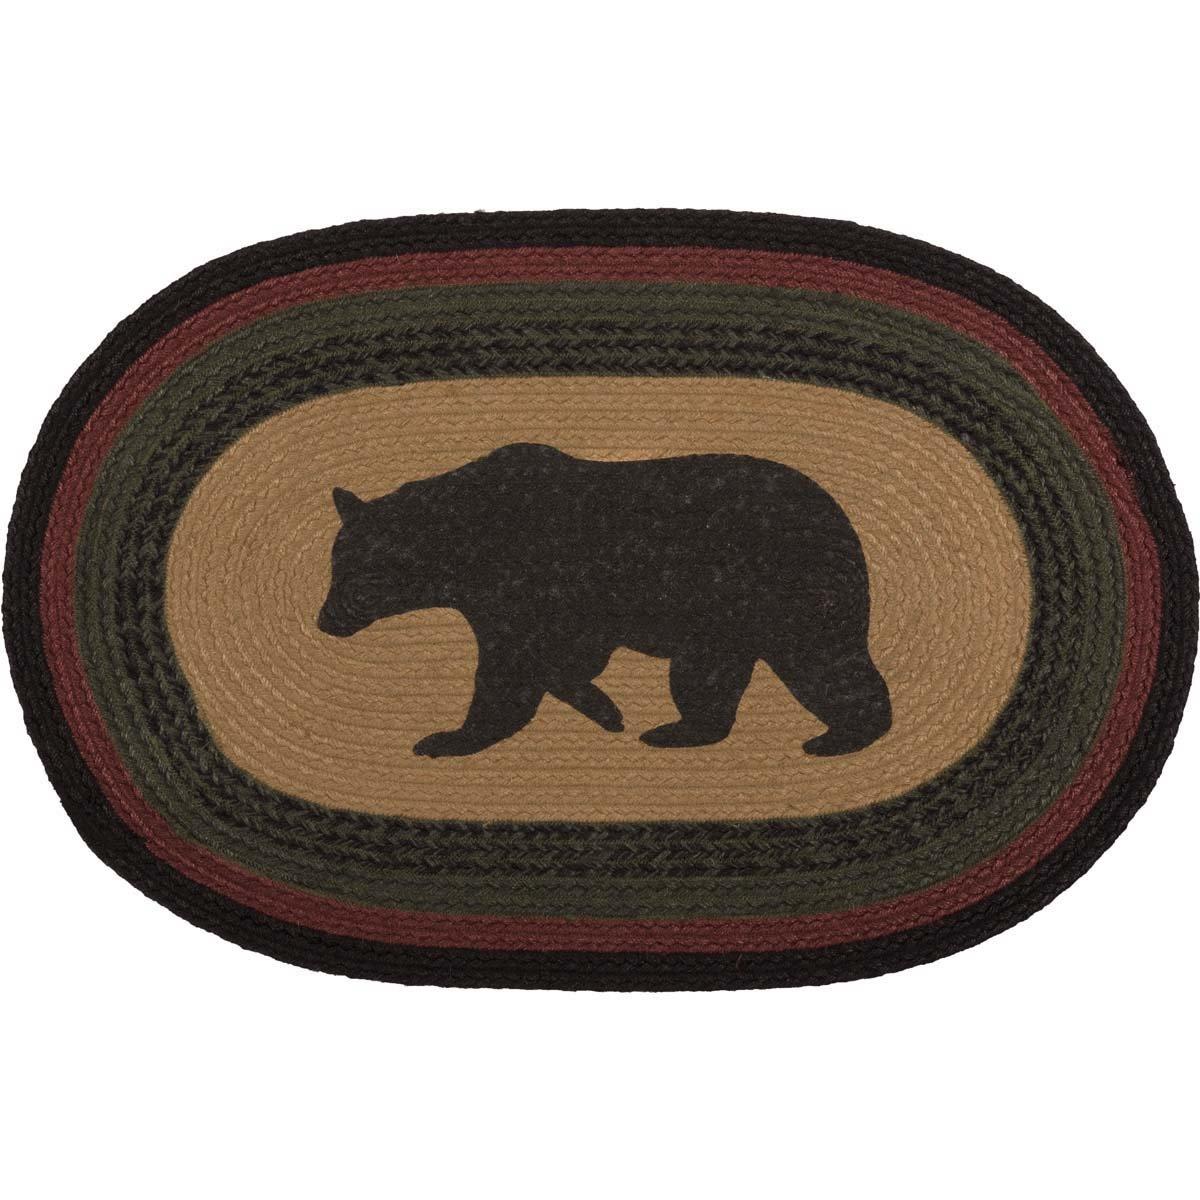 Wyatt Bear Jute Rug Oval (20x30)